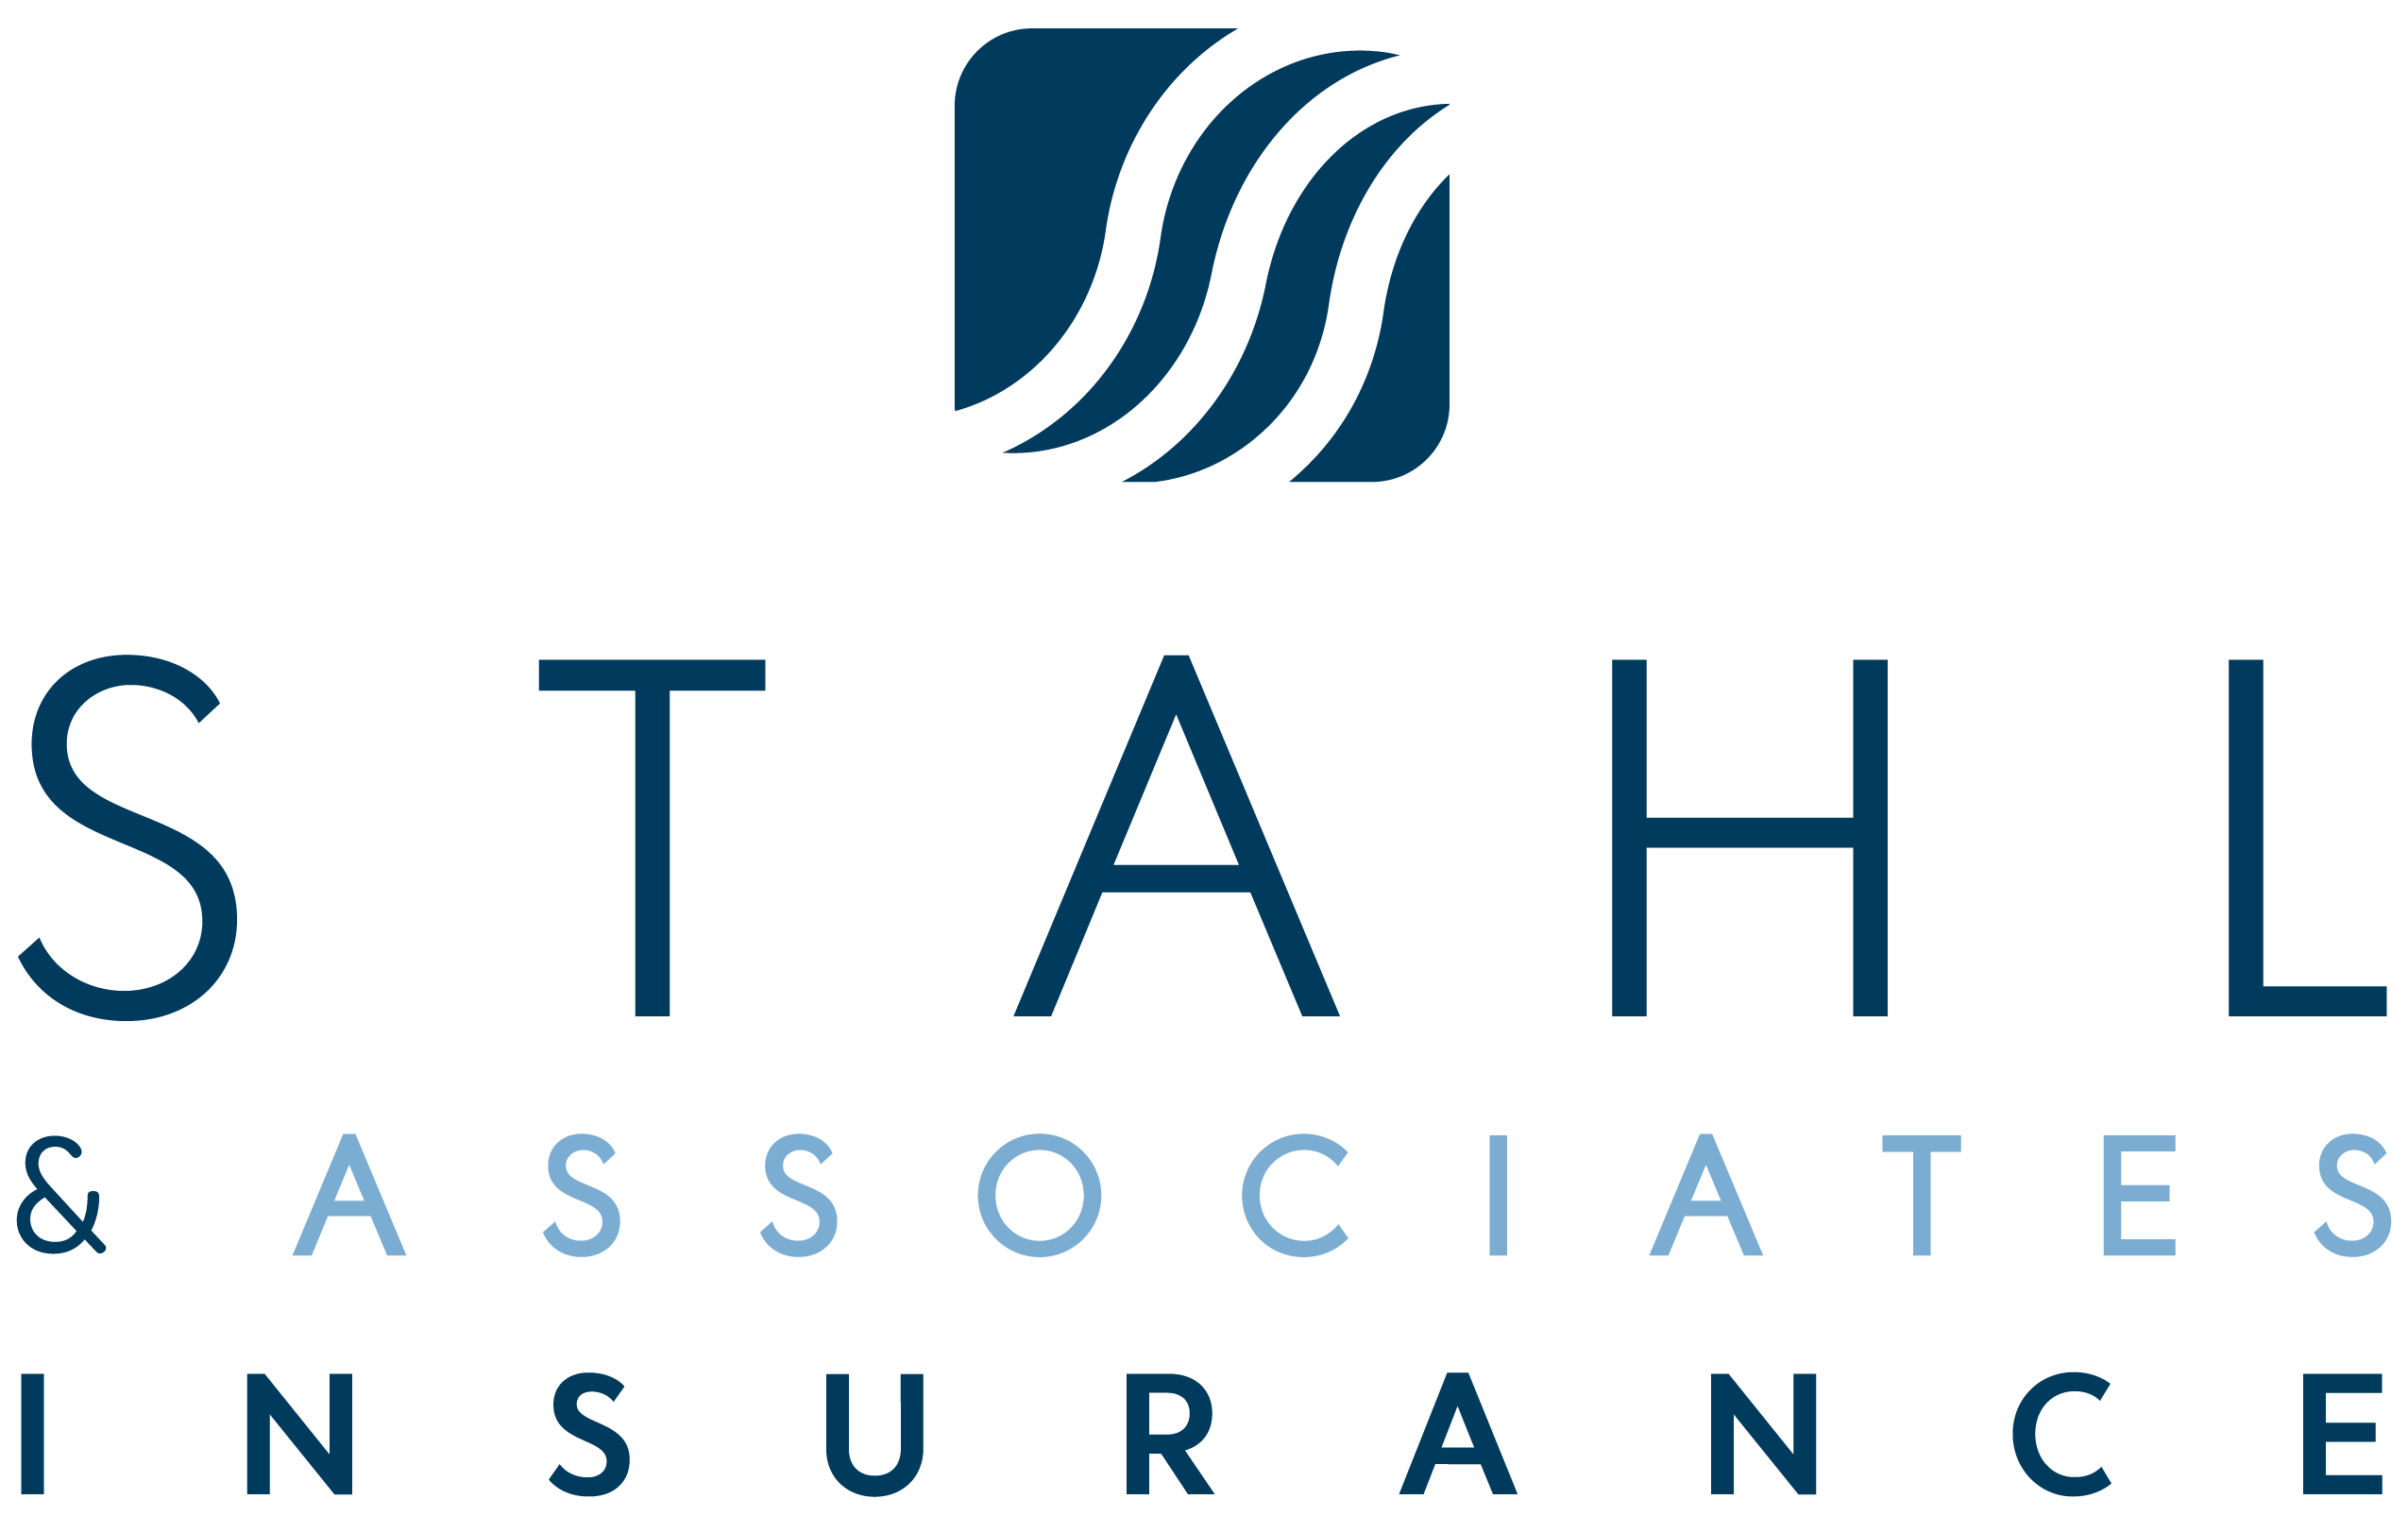 Stahl & Associates Insurance Inc logo